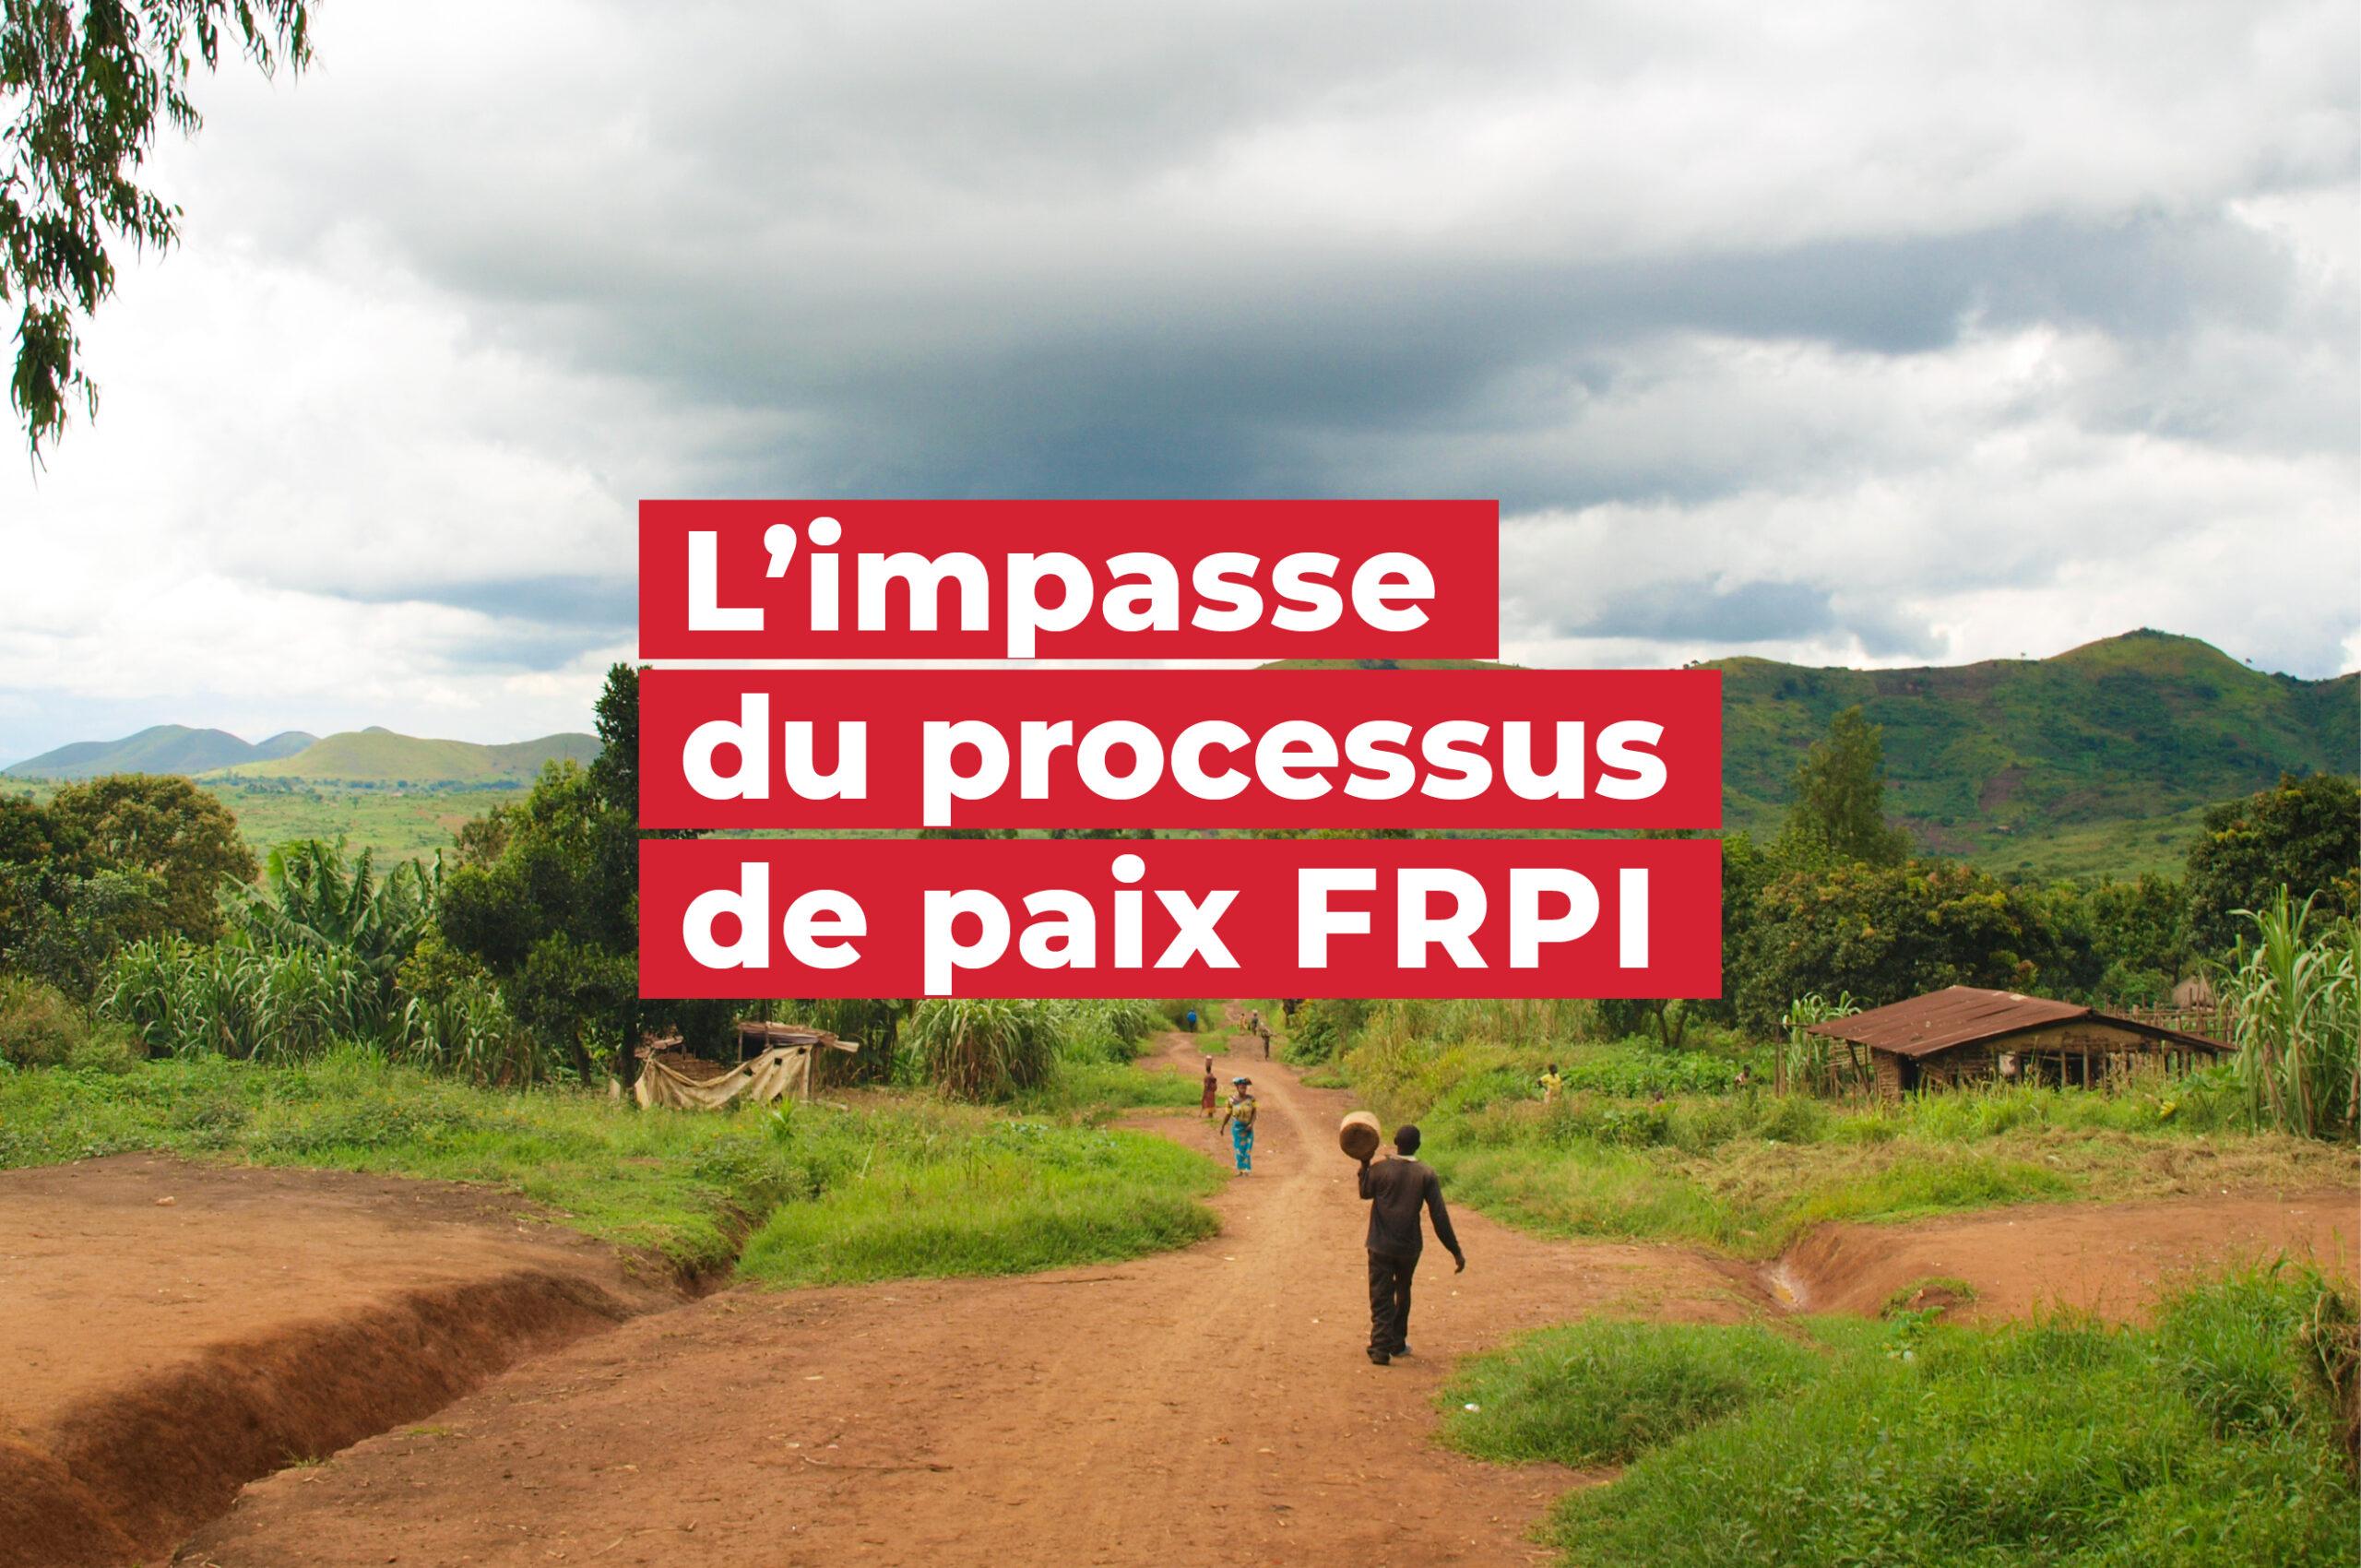 06_GIC_L'impasse du processus de paix FRPI_2